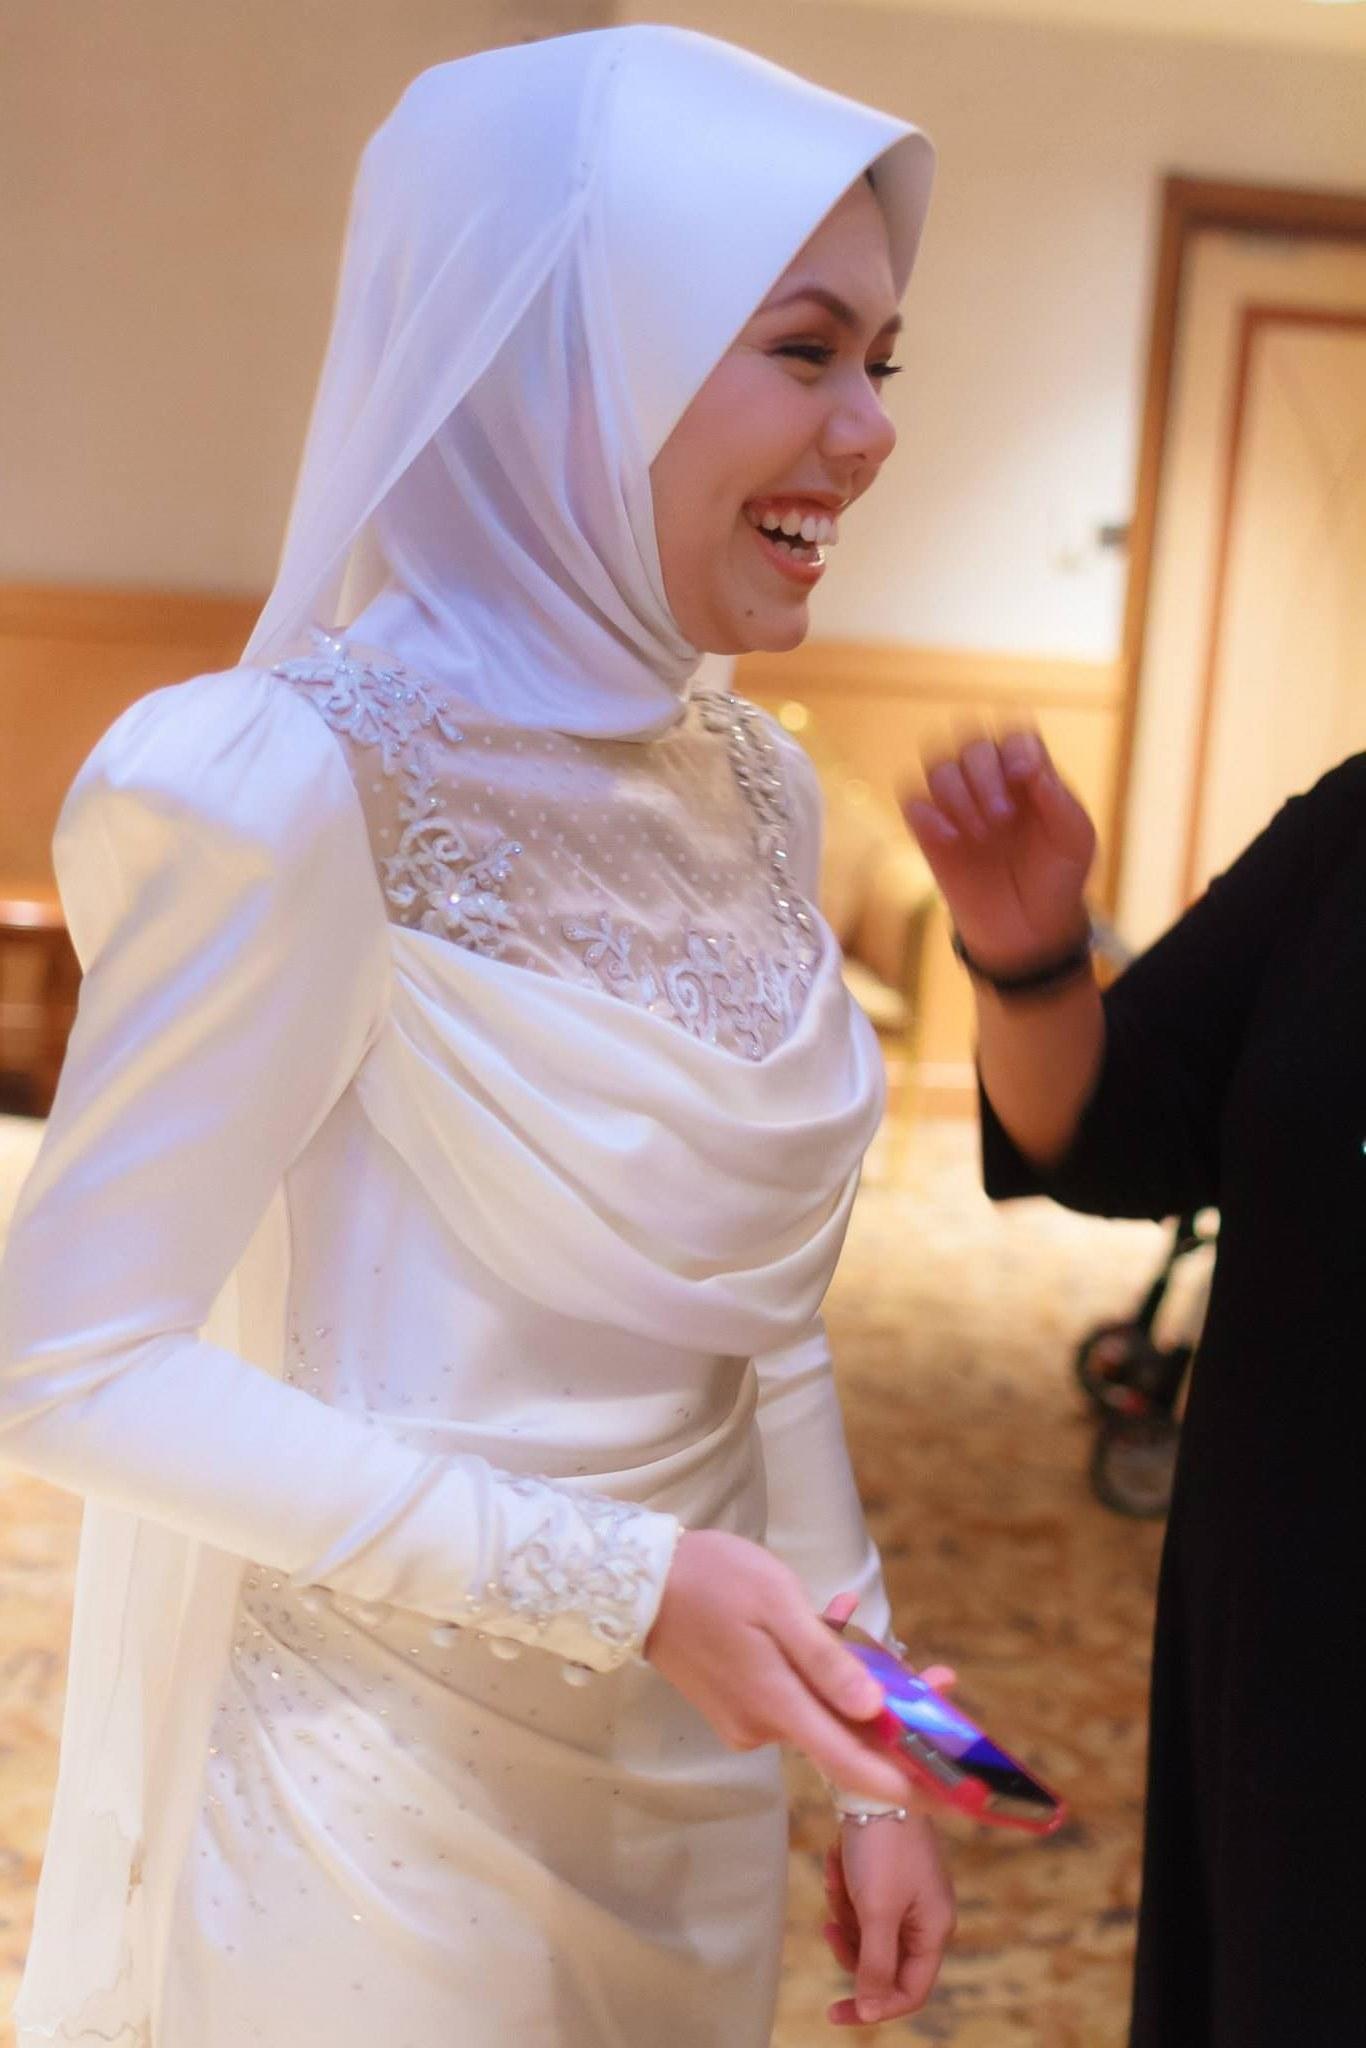 Ide Baju Pengantin Muslimah Modern Xtd6 Baju Pengantin Moden Baju Pengantin songket by Melinda